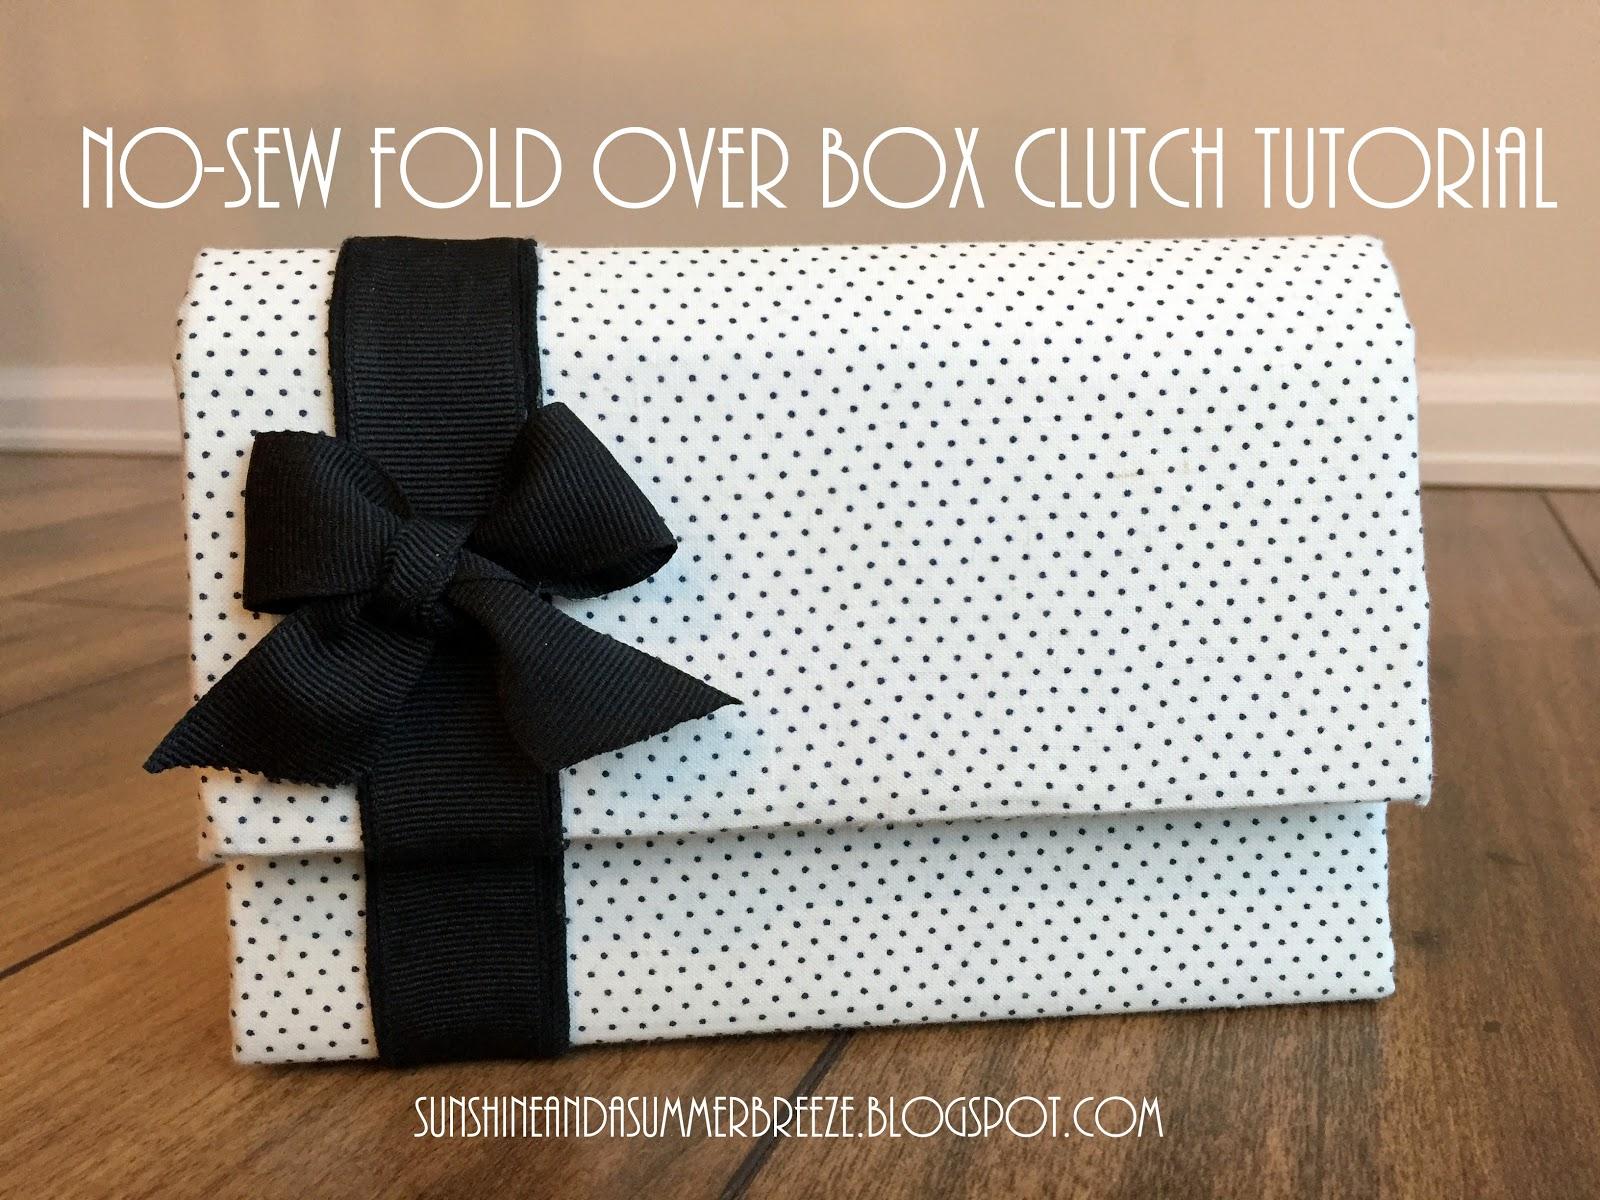 No Sew Fold Over Box Clutch Tutorial